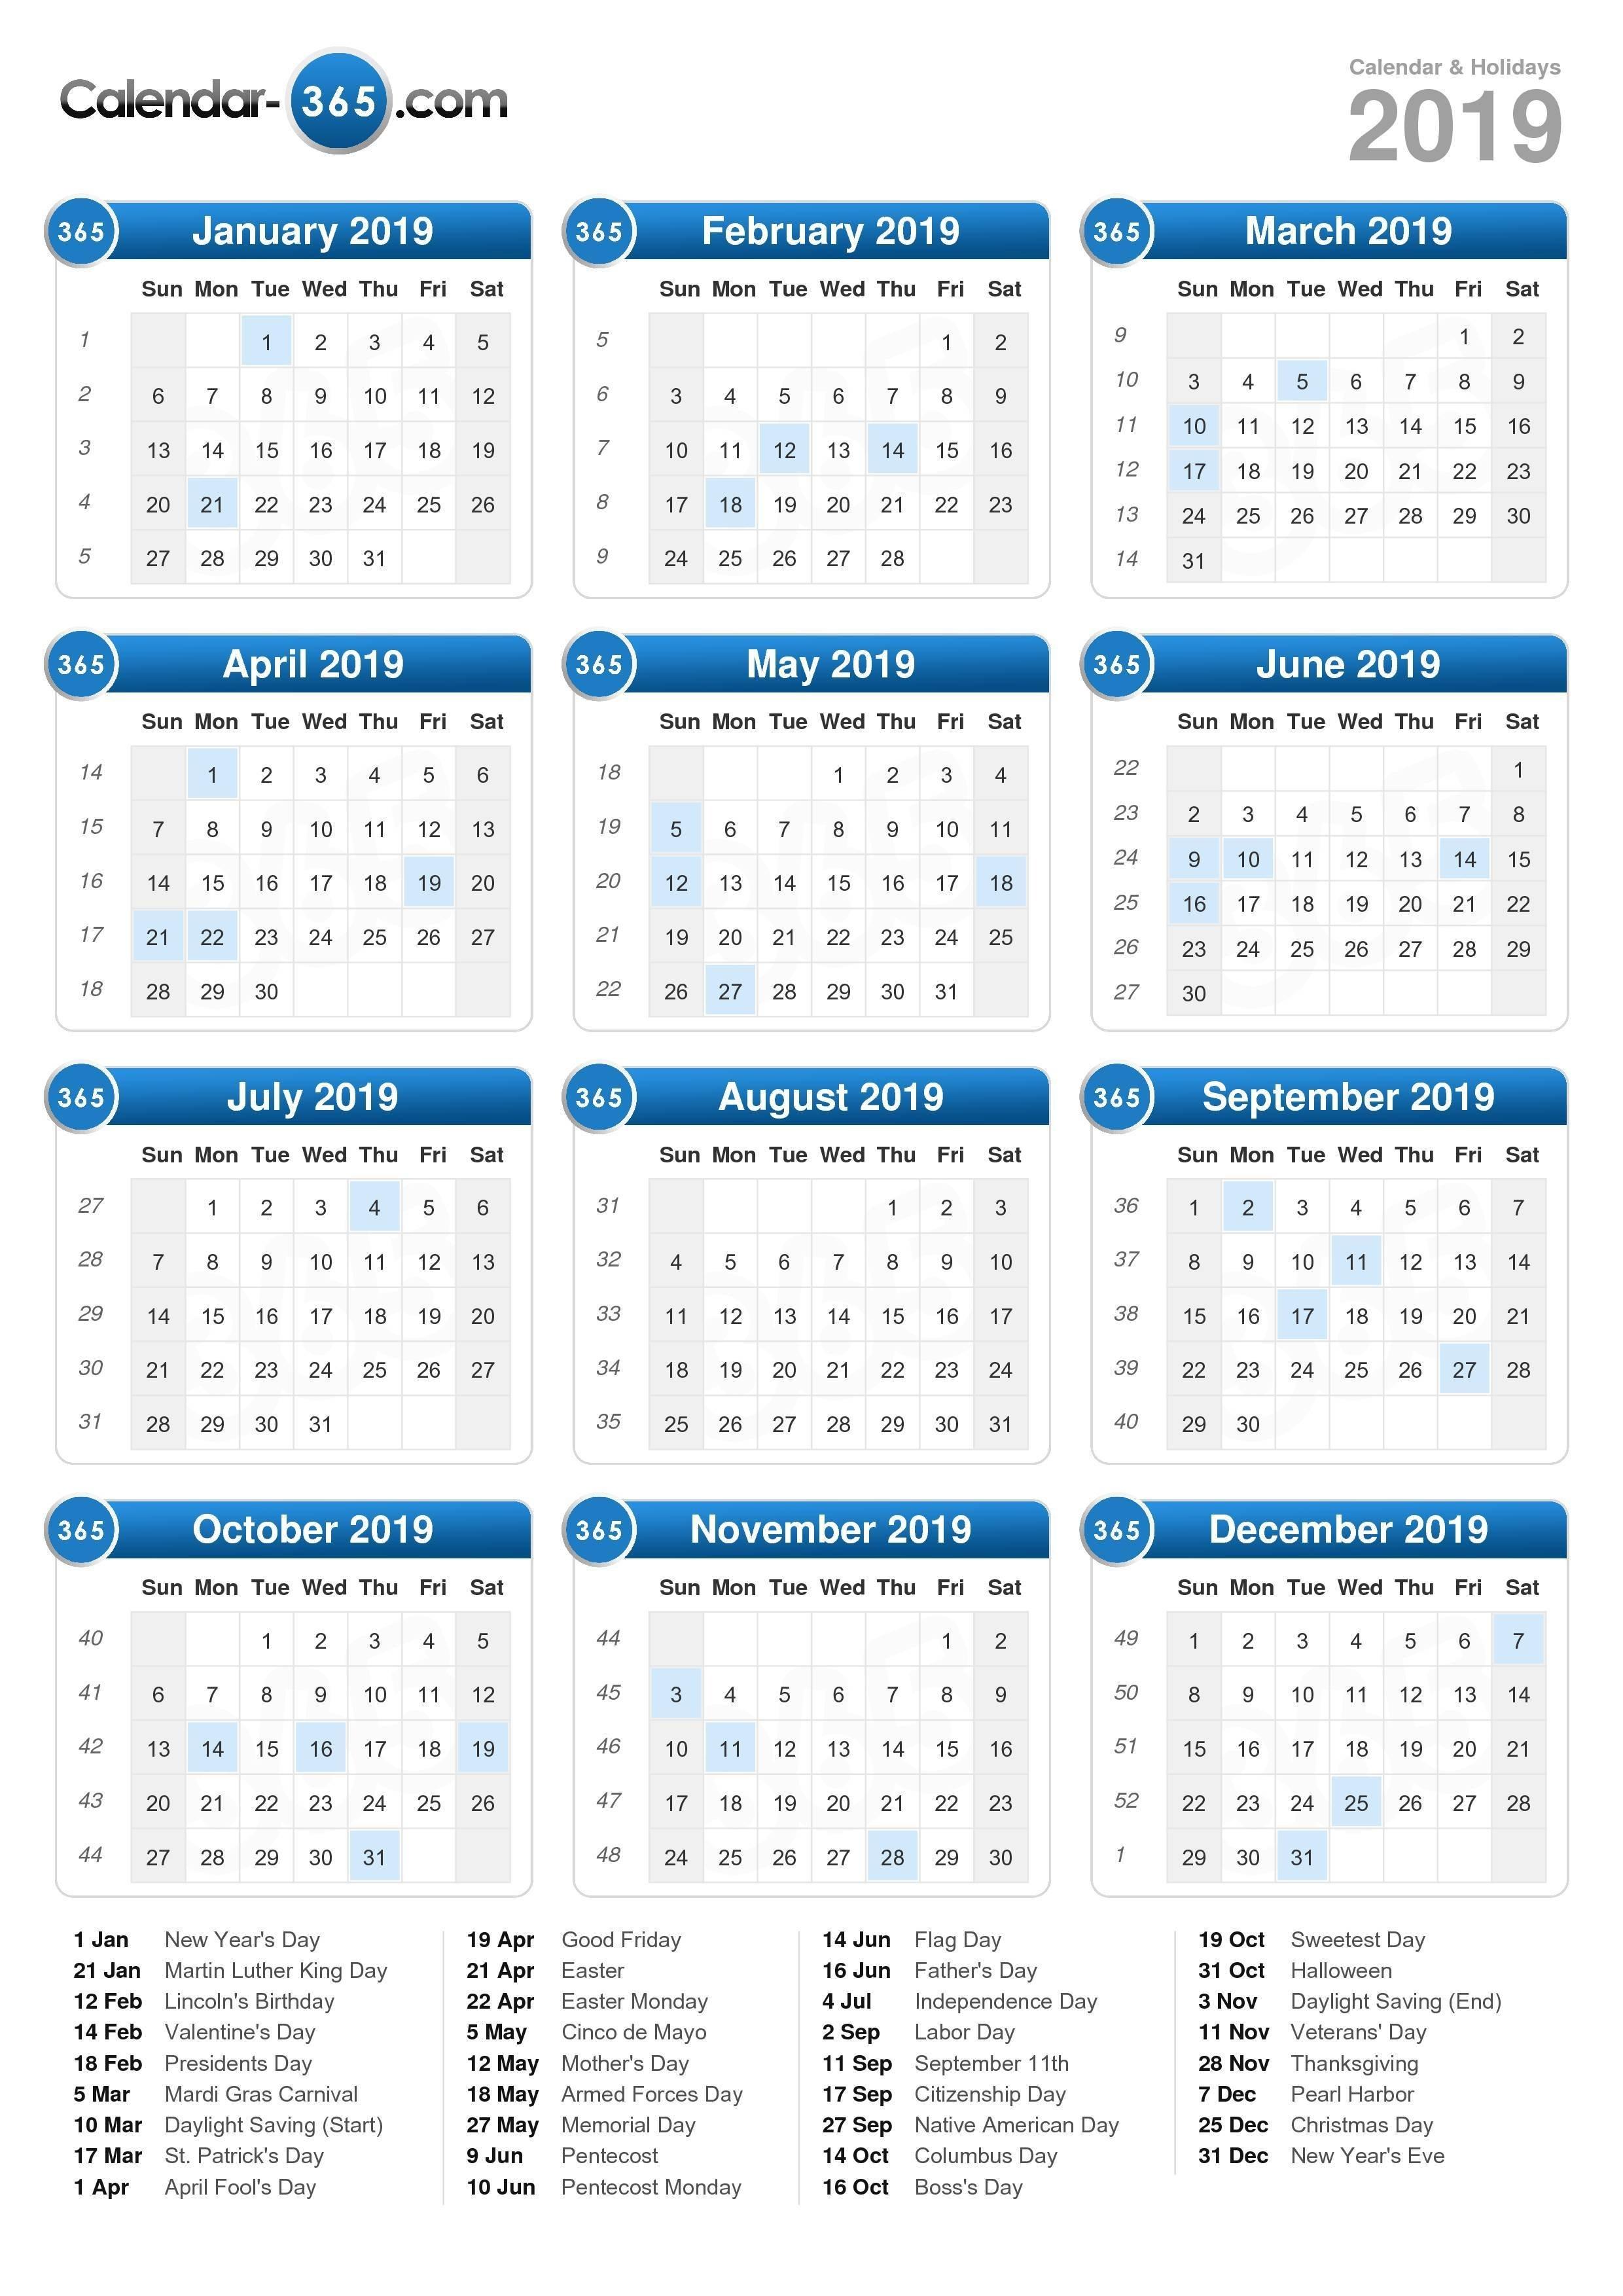 2019 Calendar Calendar 2019 Of Holidays